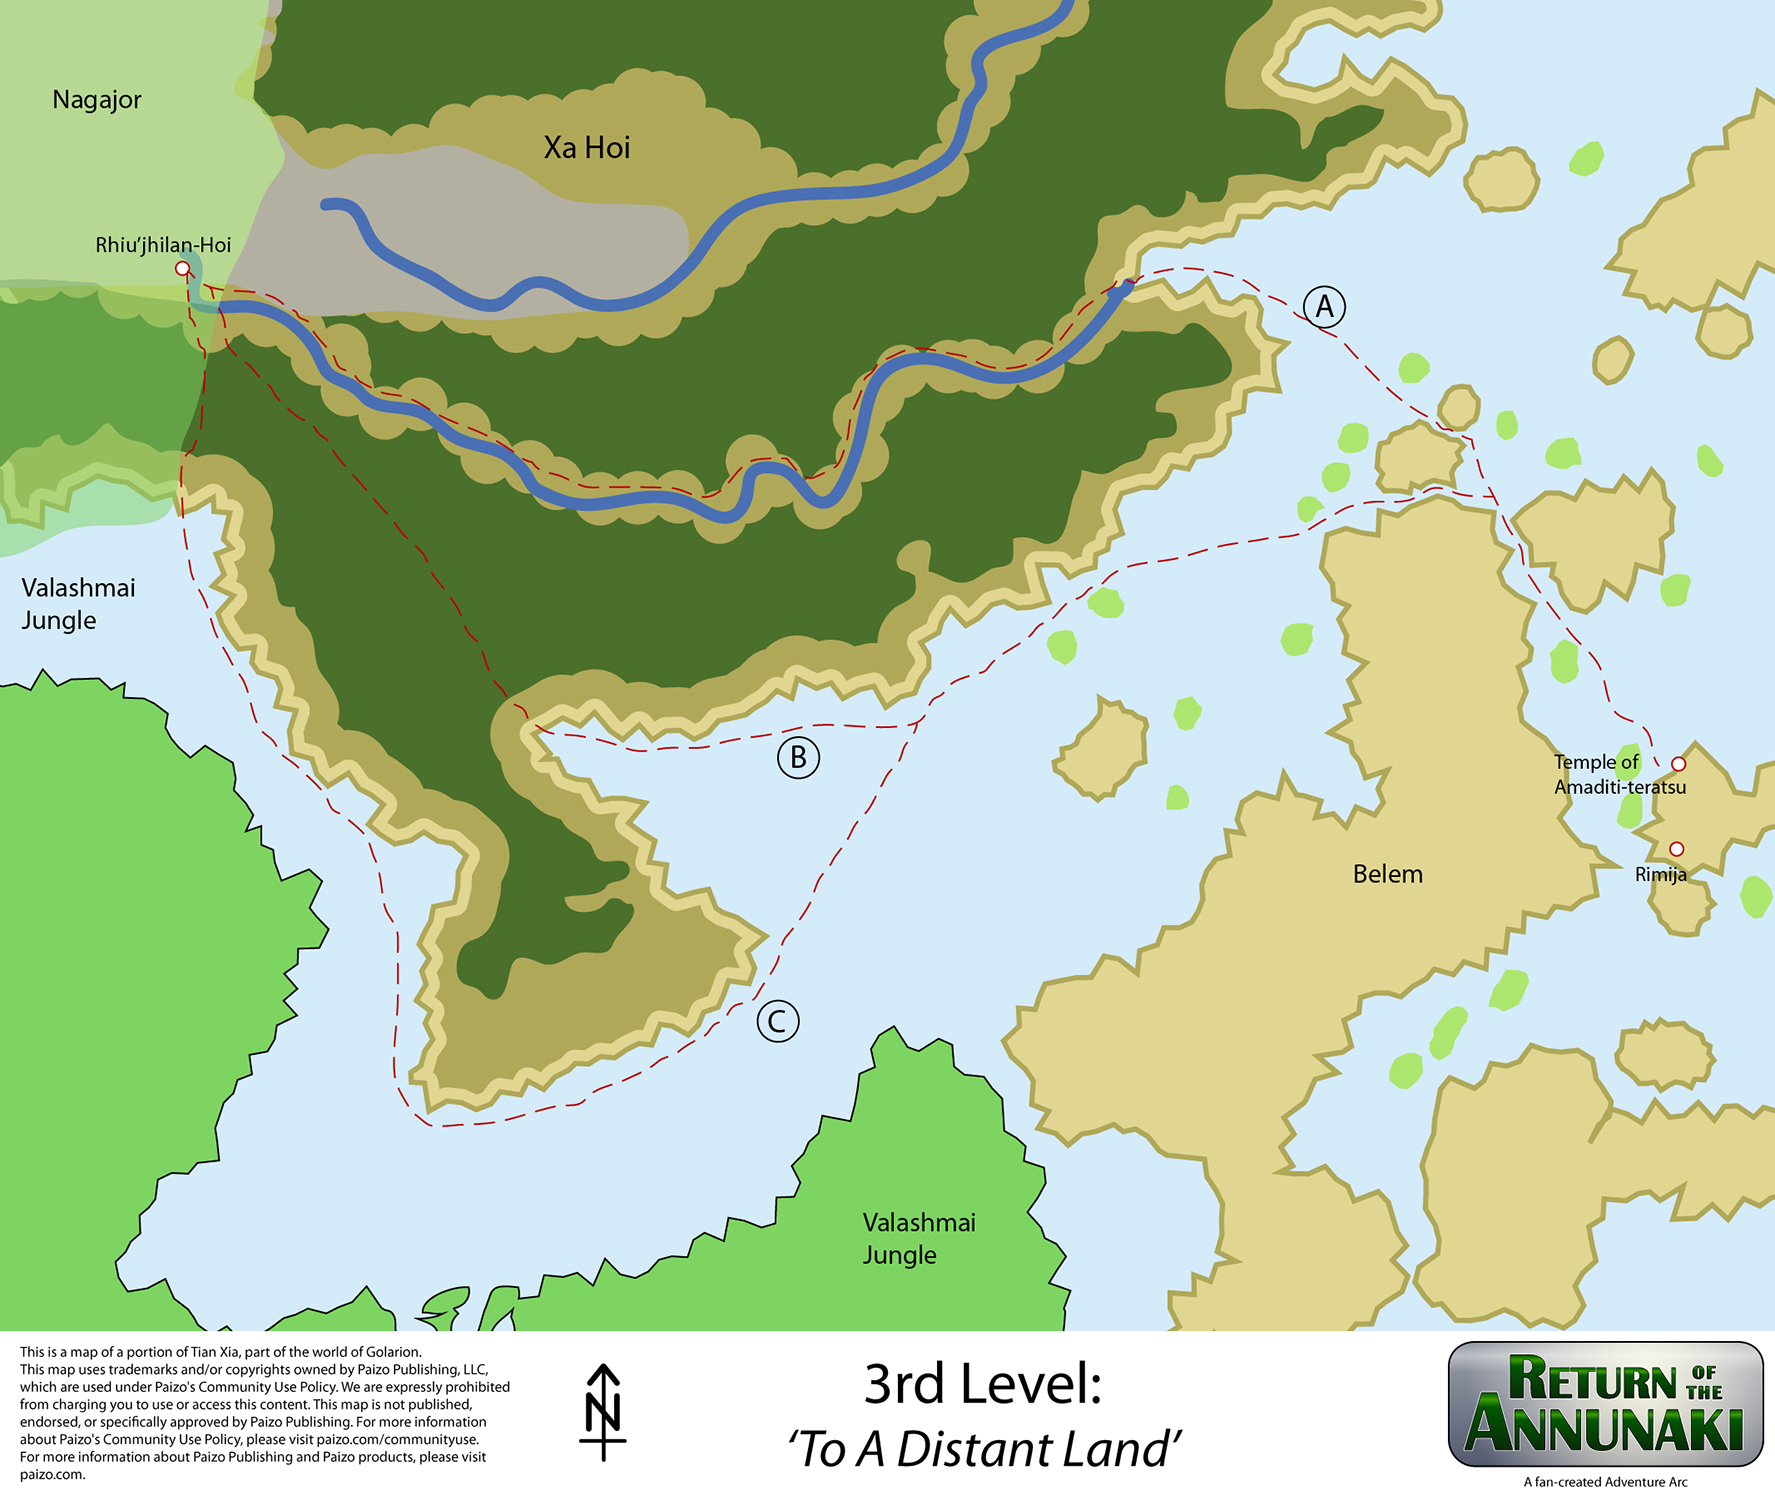 RotA map lvl03 routes to RJH, nagajor